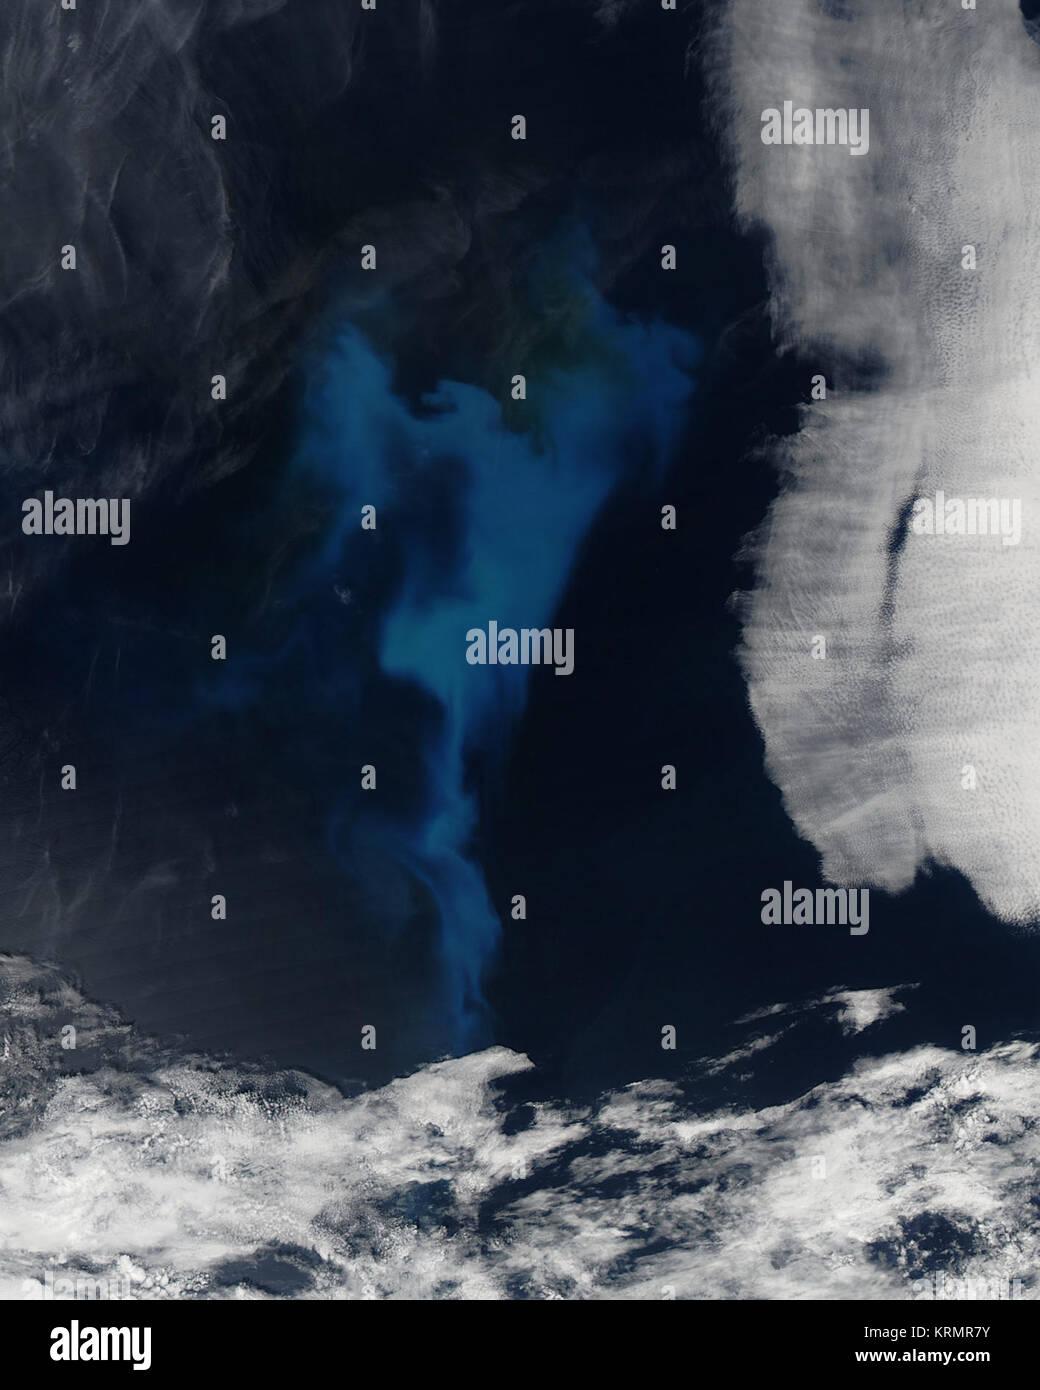 Phytoplankton bloom im Nordatlantik (9422559155) Stockfoto